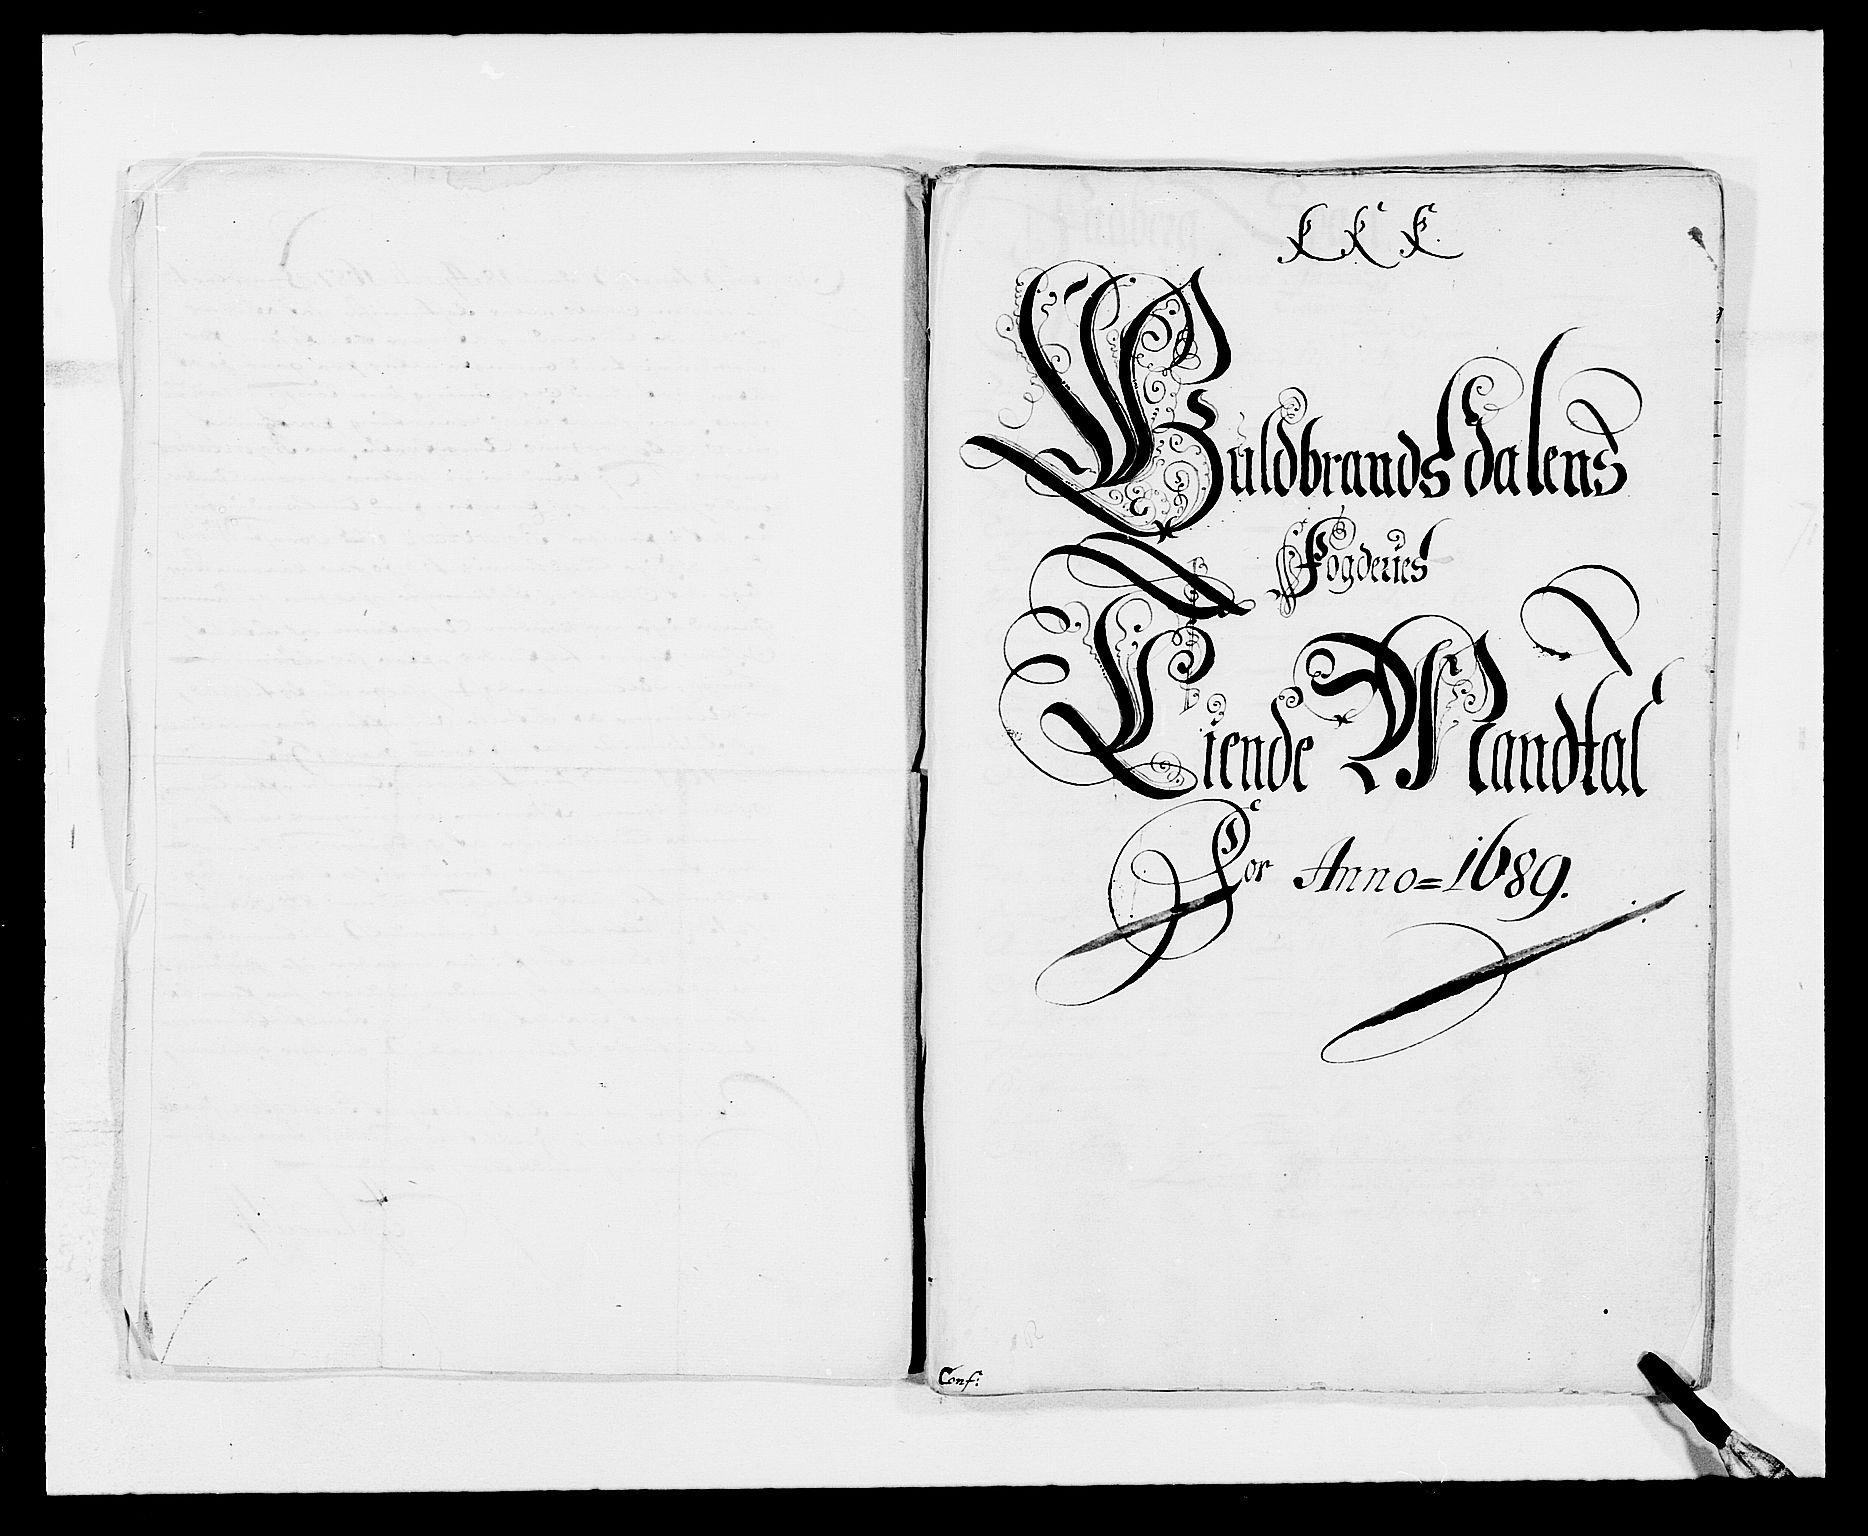 RA, Rentekammeret inntil 1814, Reviderte regnskaper, Fogderegnskap, R17/L1164: Fogderegnskap Gudbrandsdal, 1682-1689, s. 35